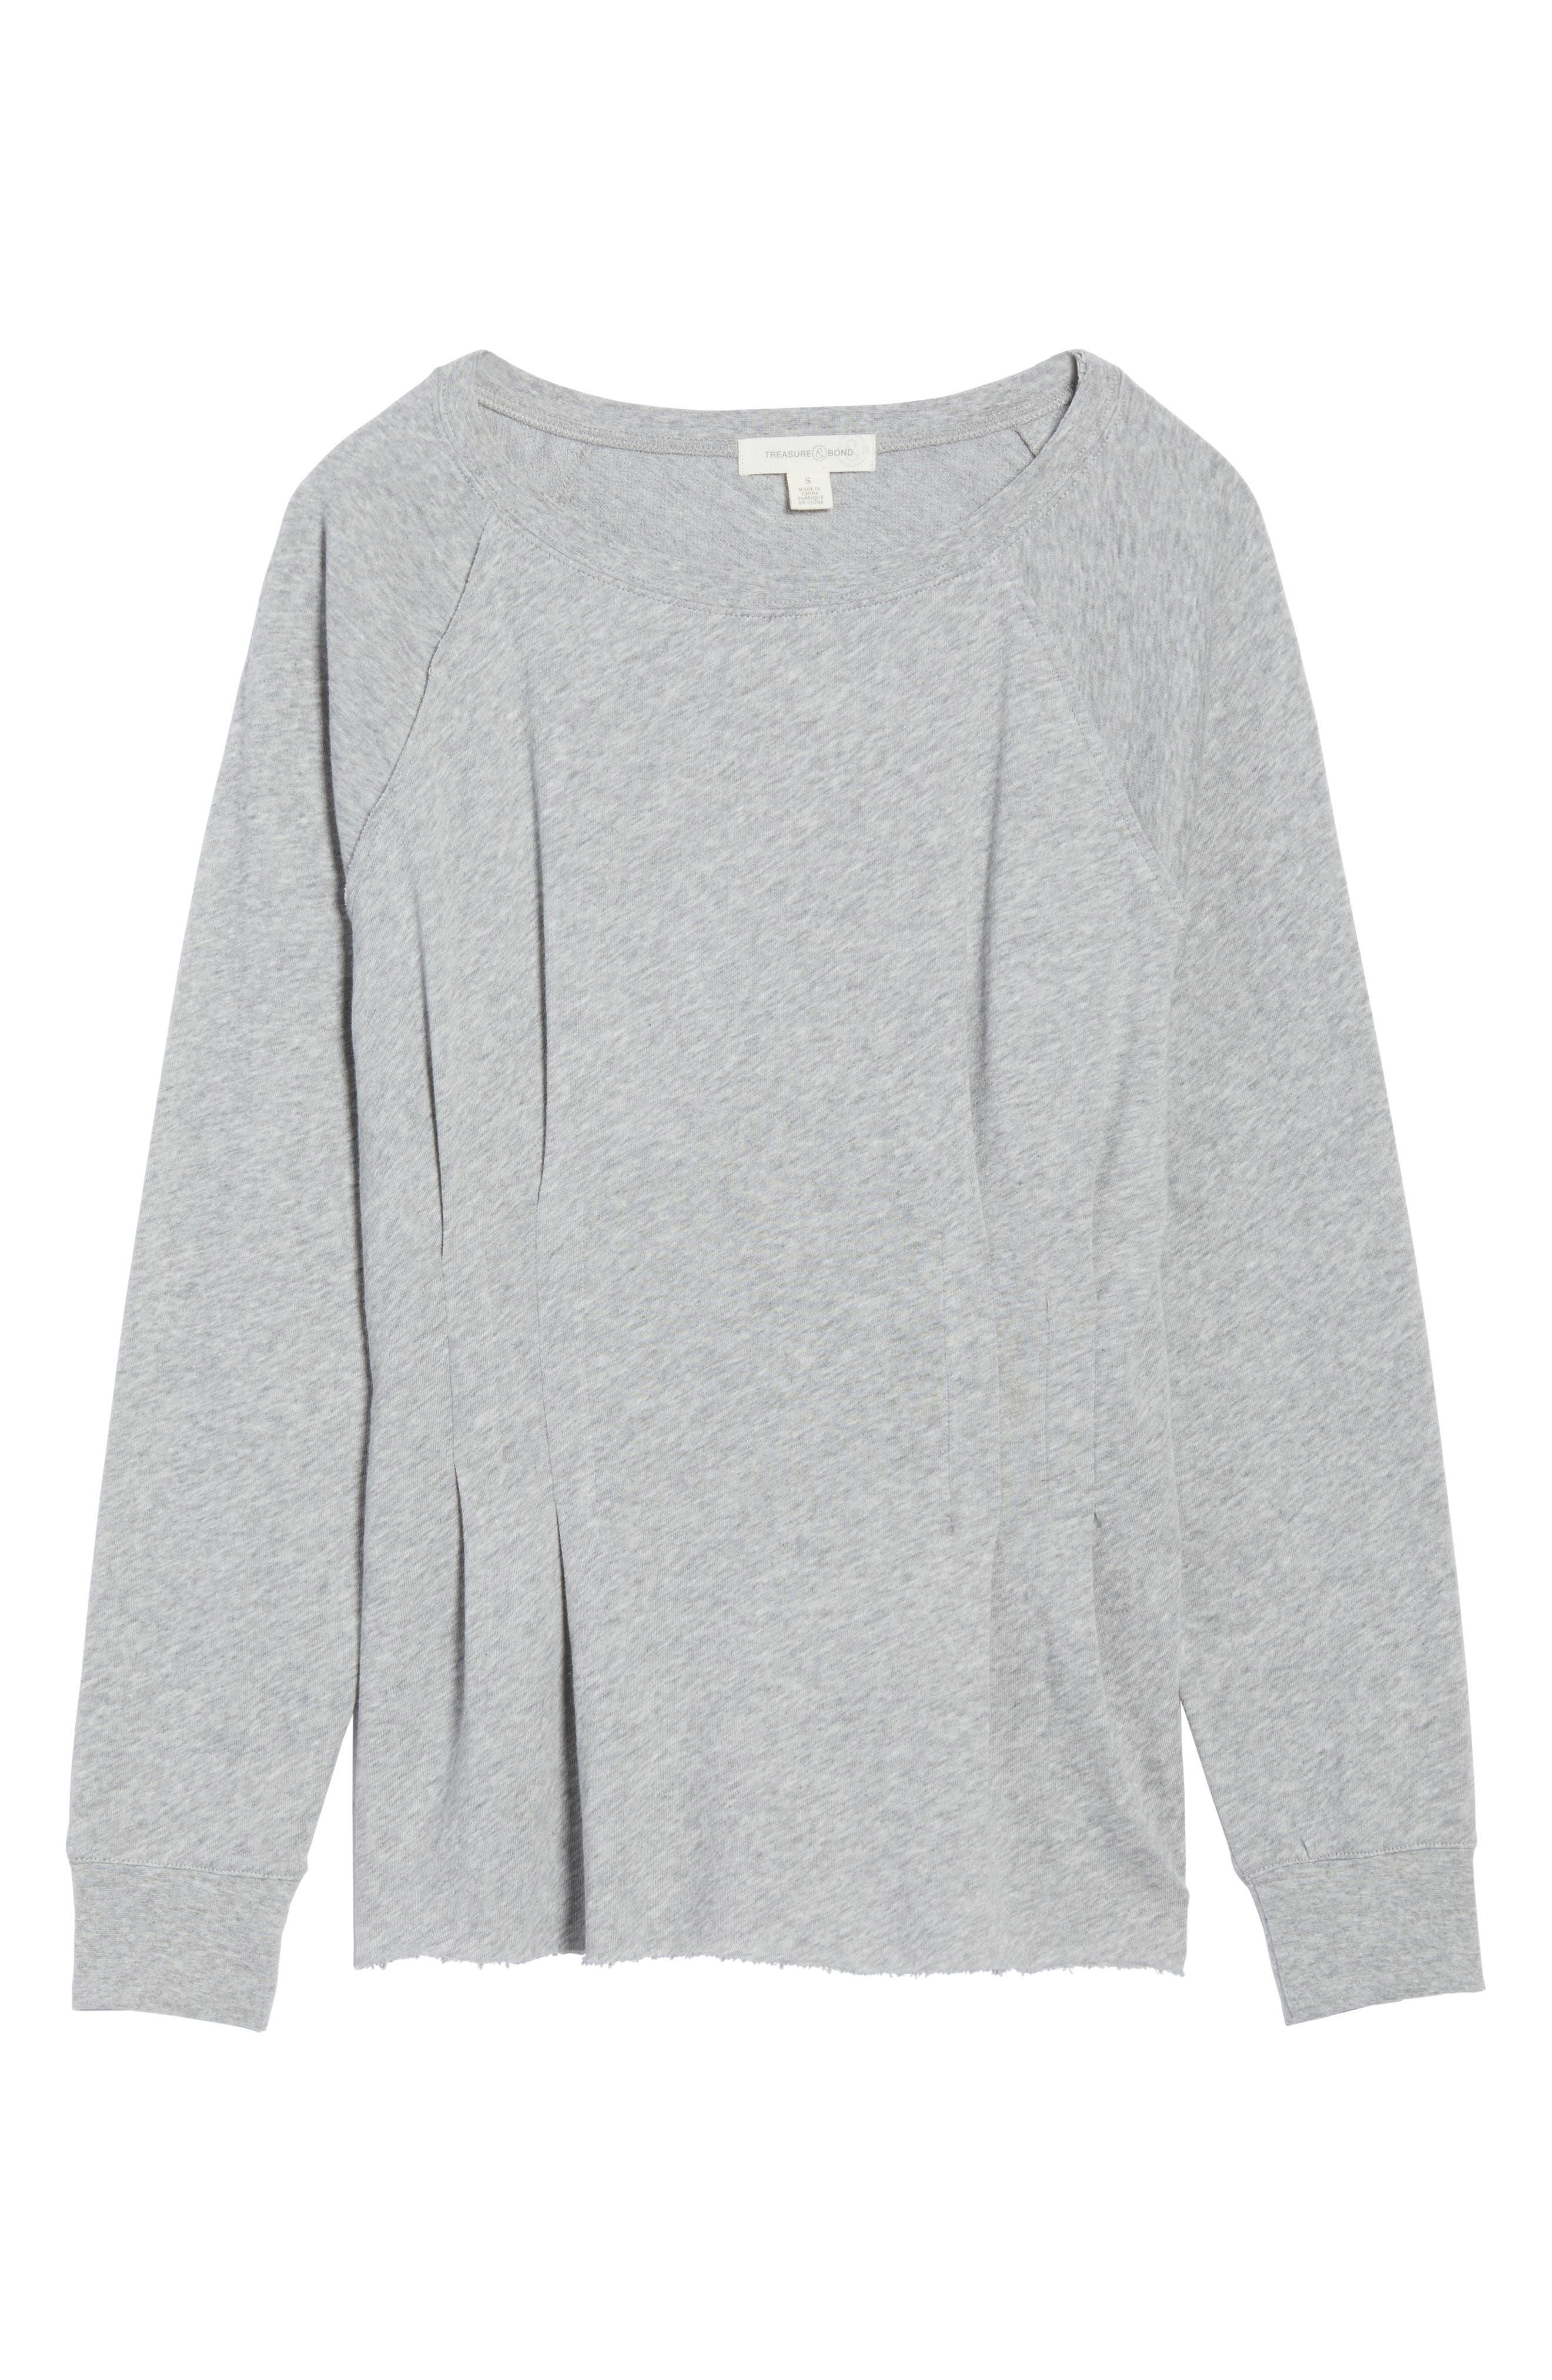 Cinch Waist Sweatshirt,                             Alternate thumbnail 6, color,                             020